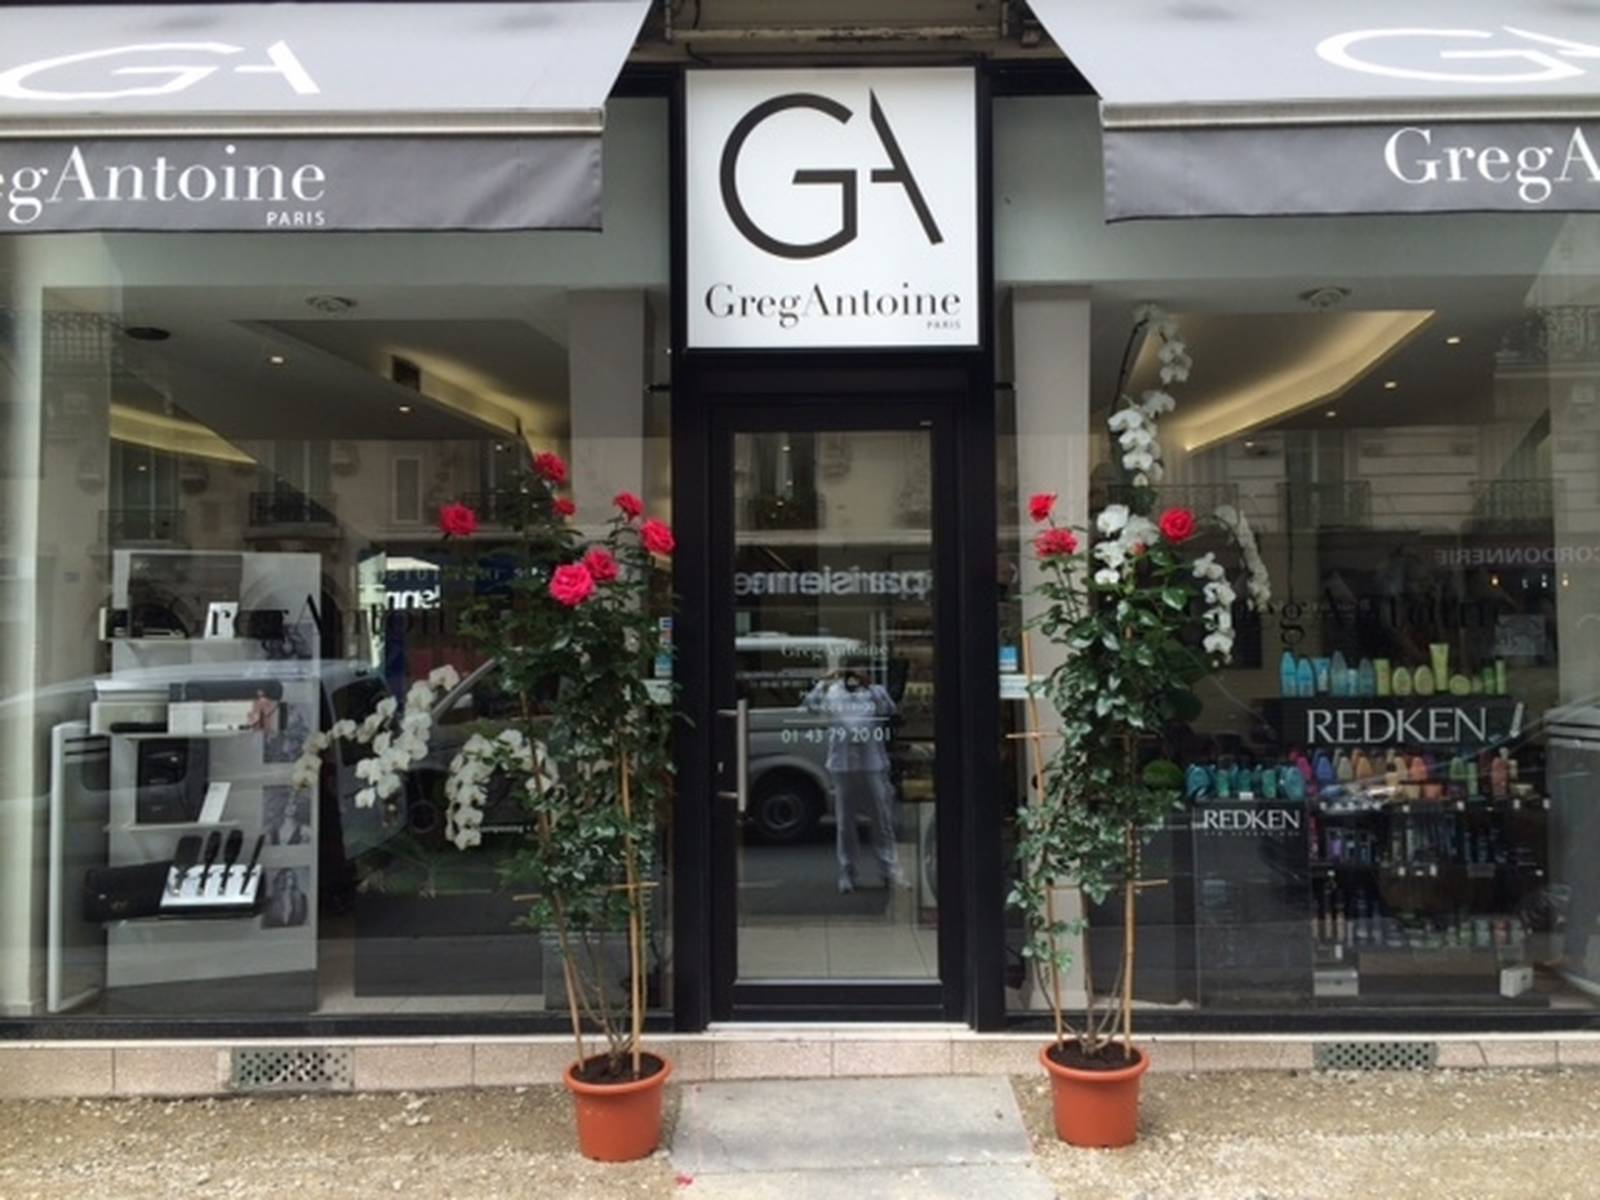 Greg Antoine Coiffeur Paris Hairdressers In Gay Paris Misterb B